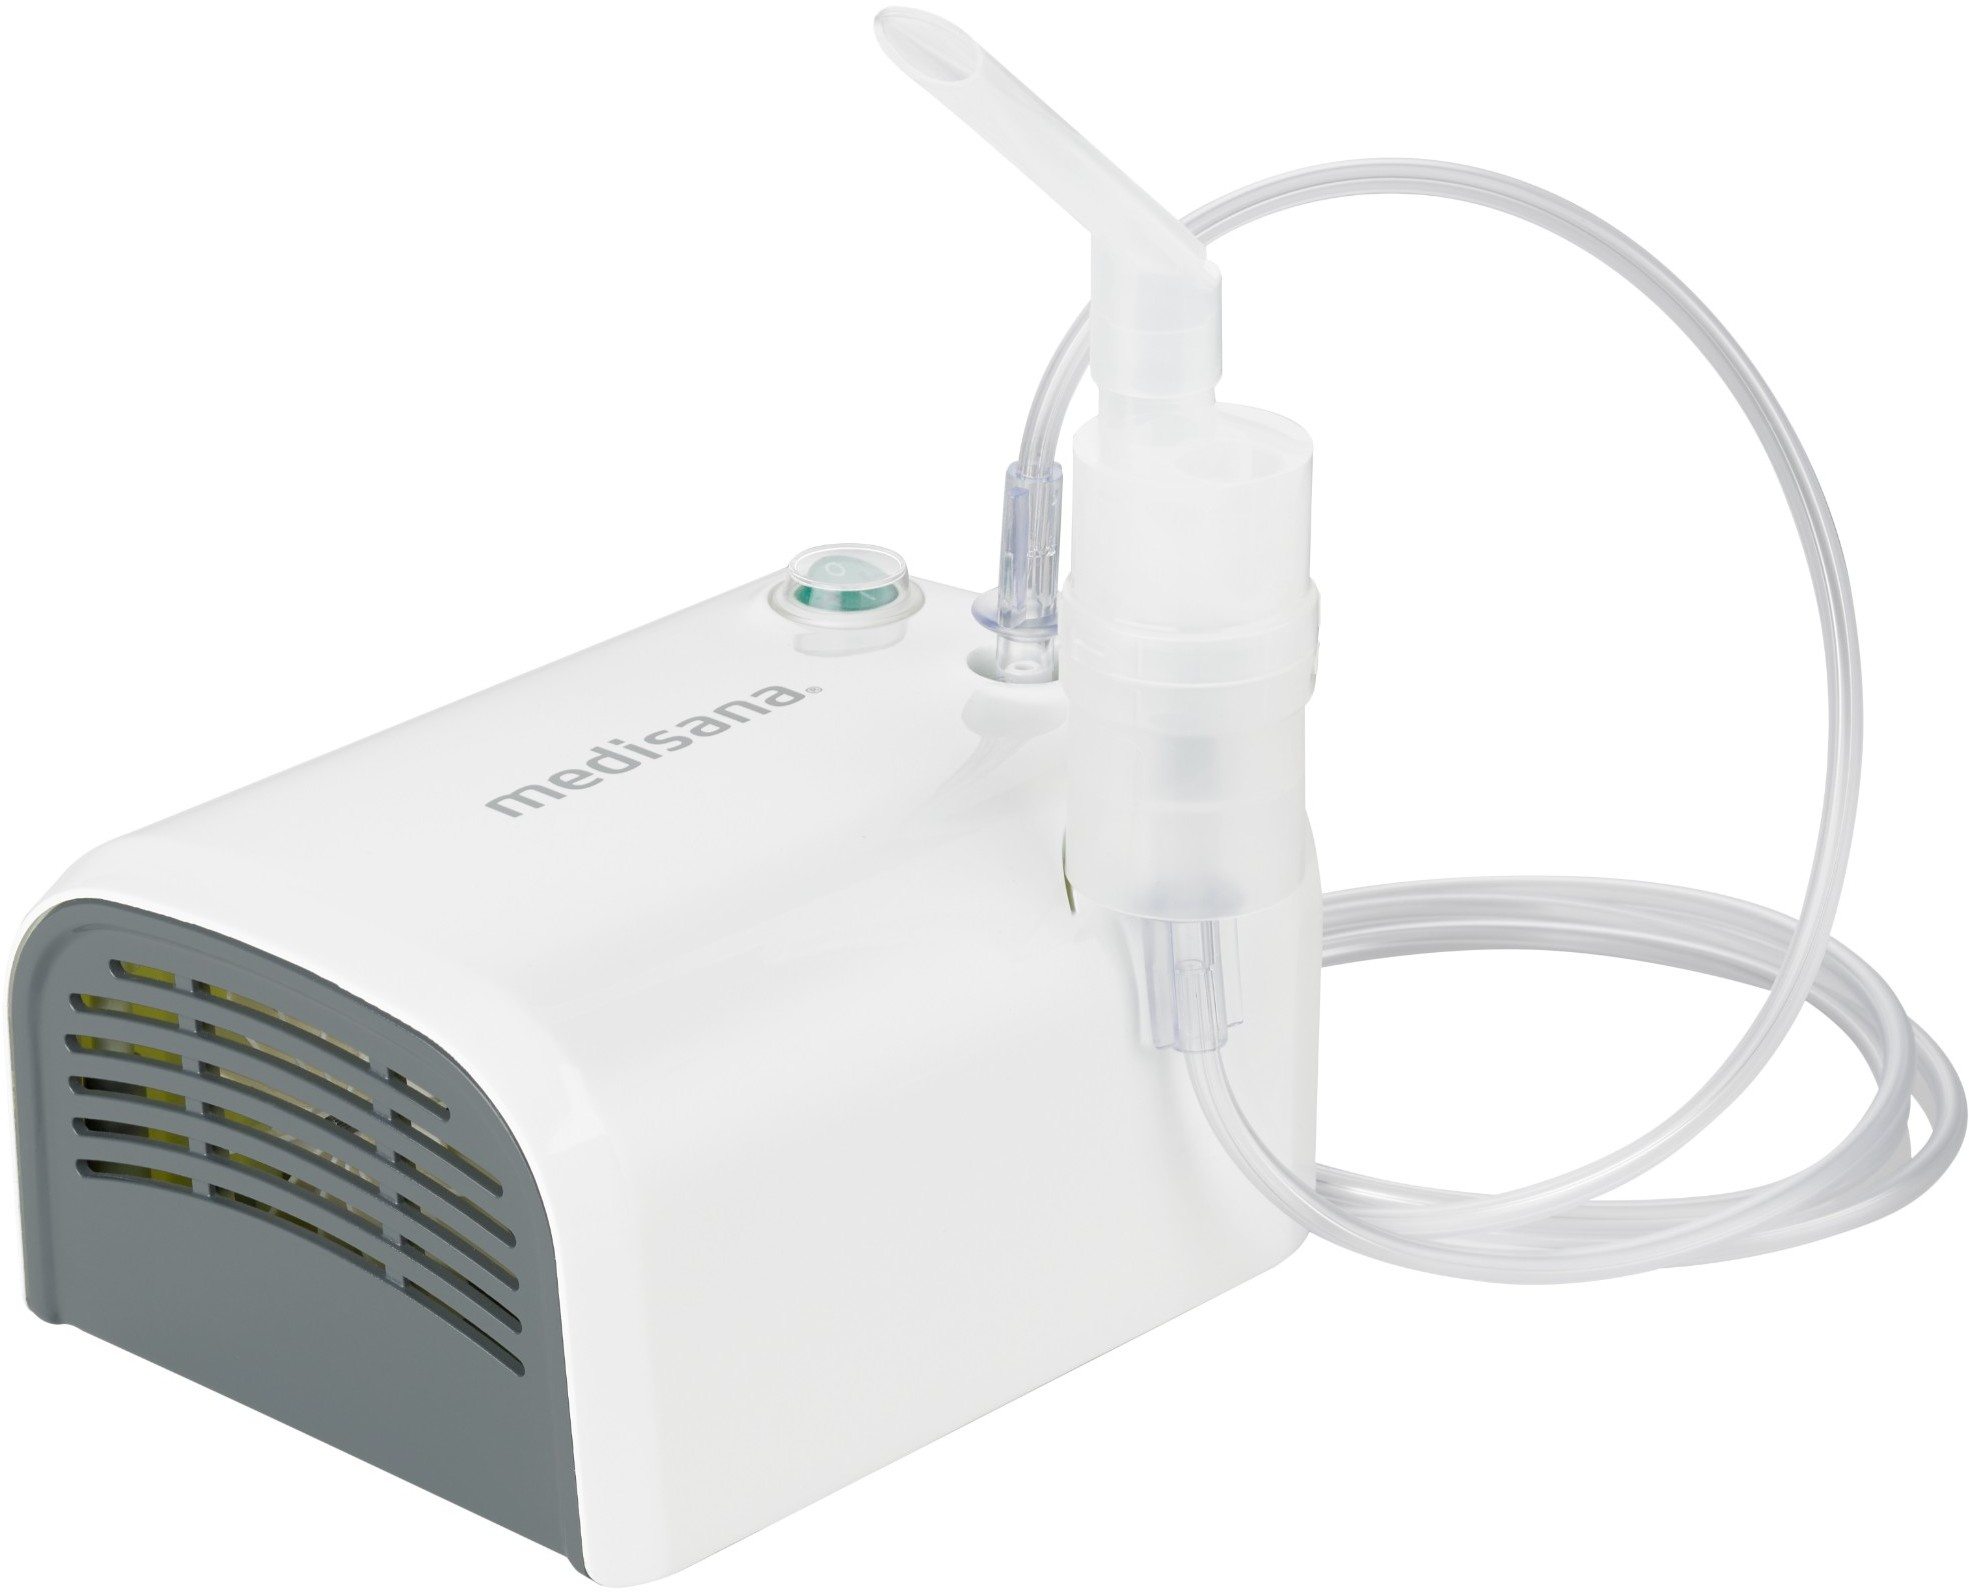 IN 520 Inhalator 54548